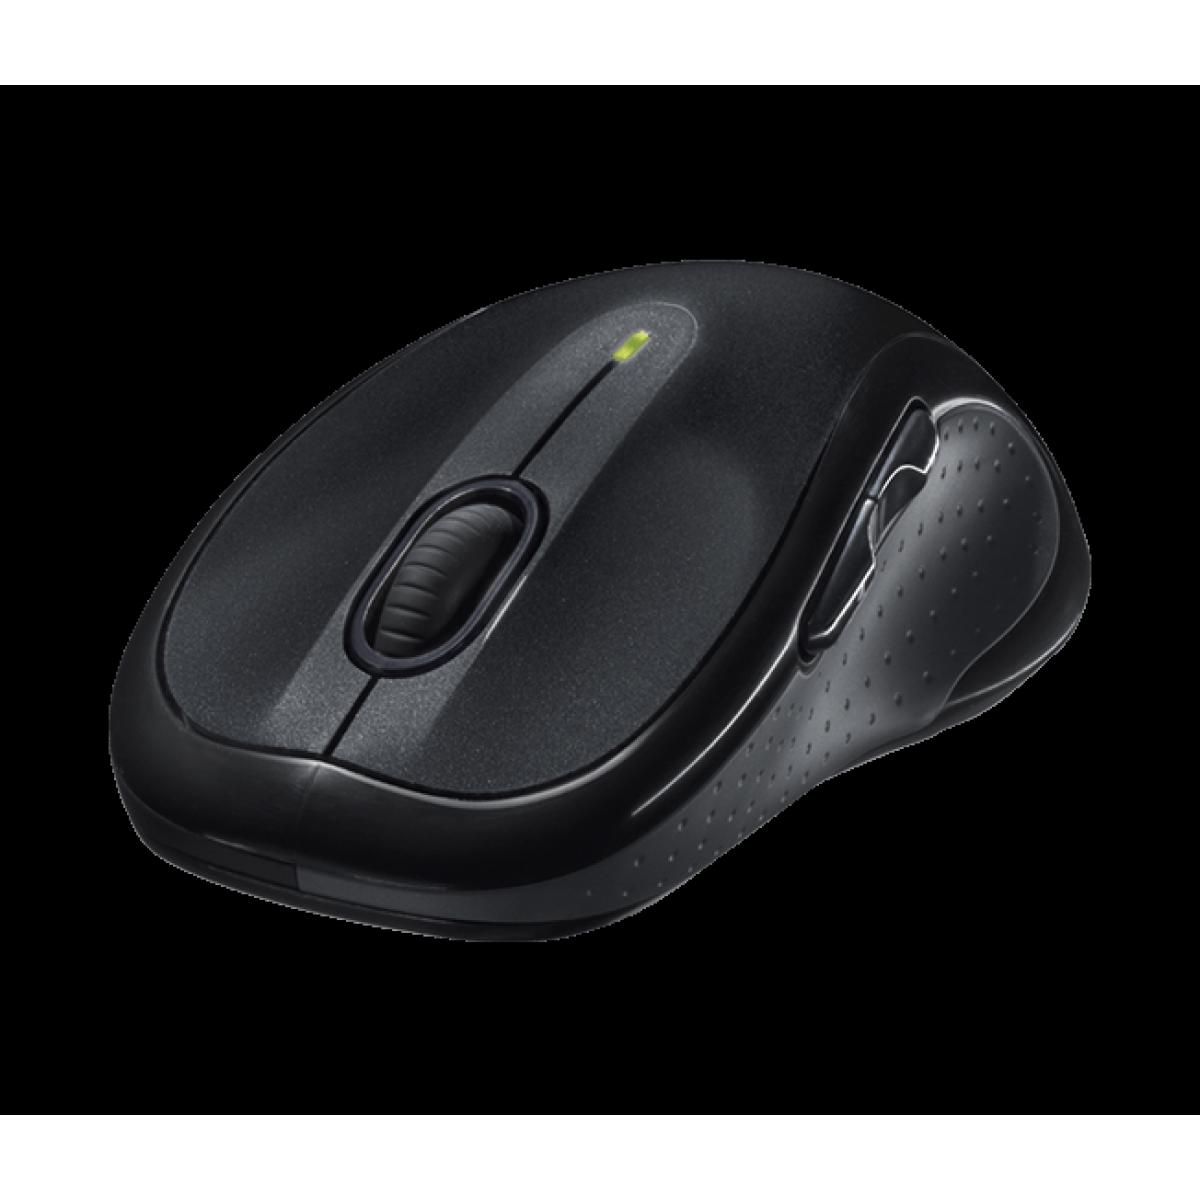 Mouse Wireless Logitech M510, 1000 DPI, Black, 910-001822